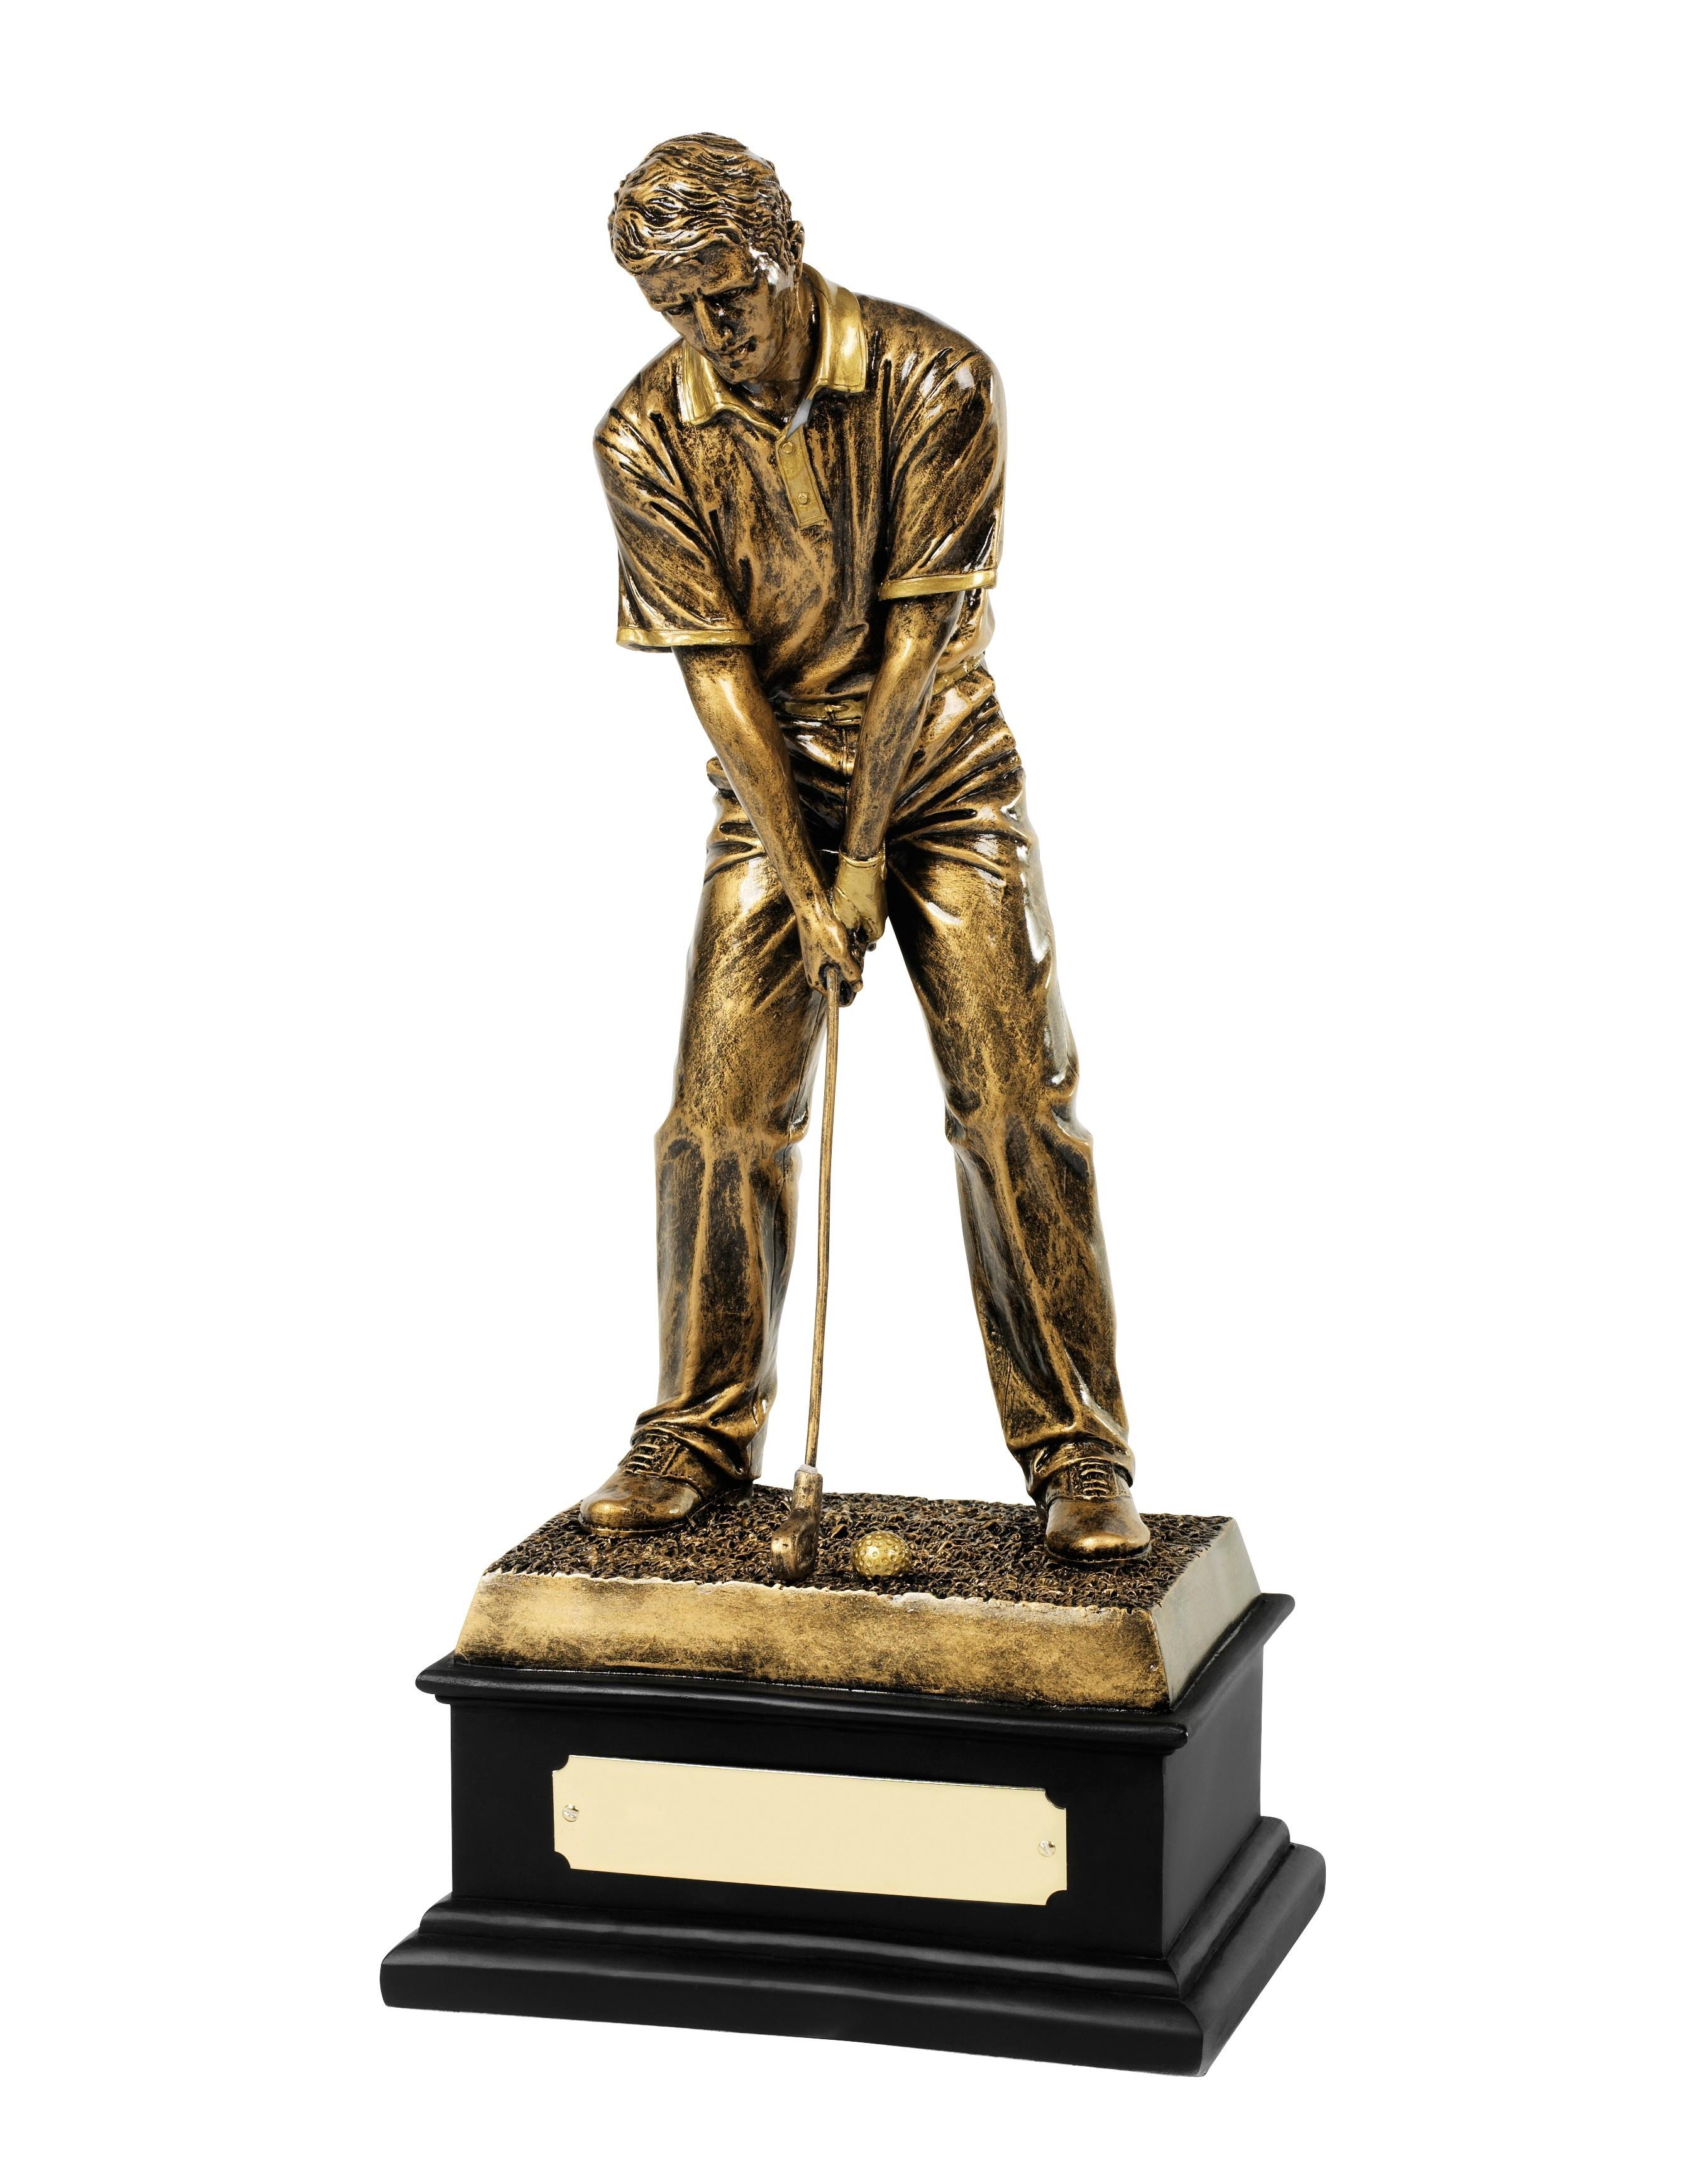 32cm Golf Figure